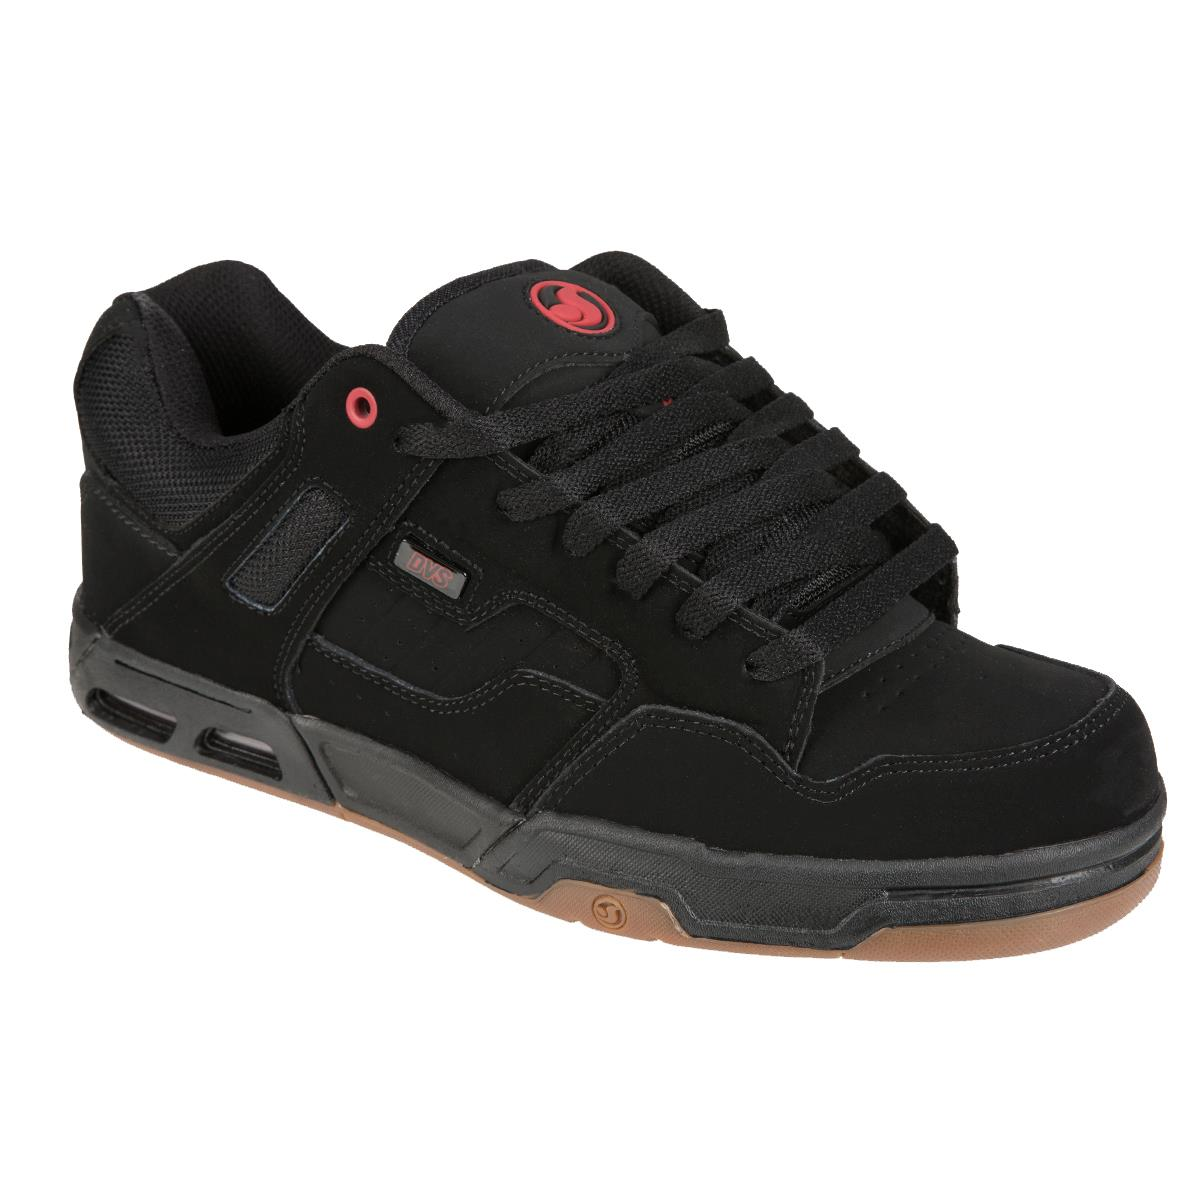 DVS Schuhe Enduro Heir Schwarz/Rot Gum Nubuk